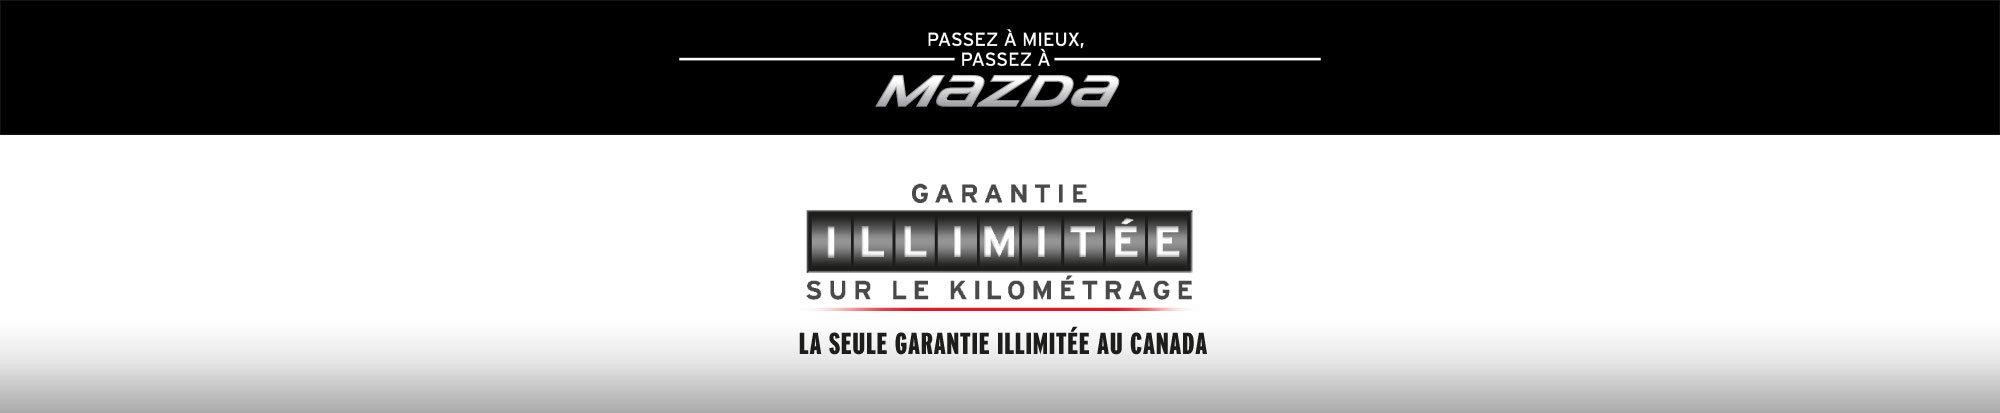 GARANTIE KILOMÉTRAGE ILLIMITÉE web